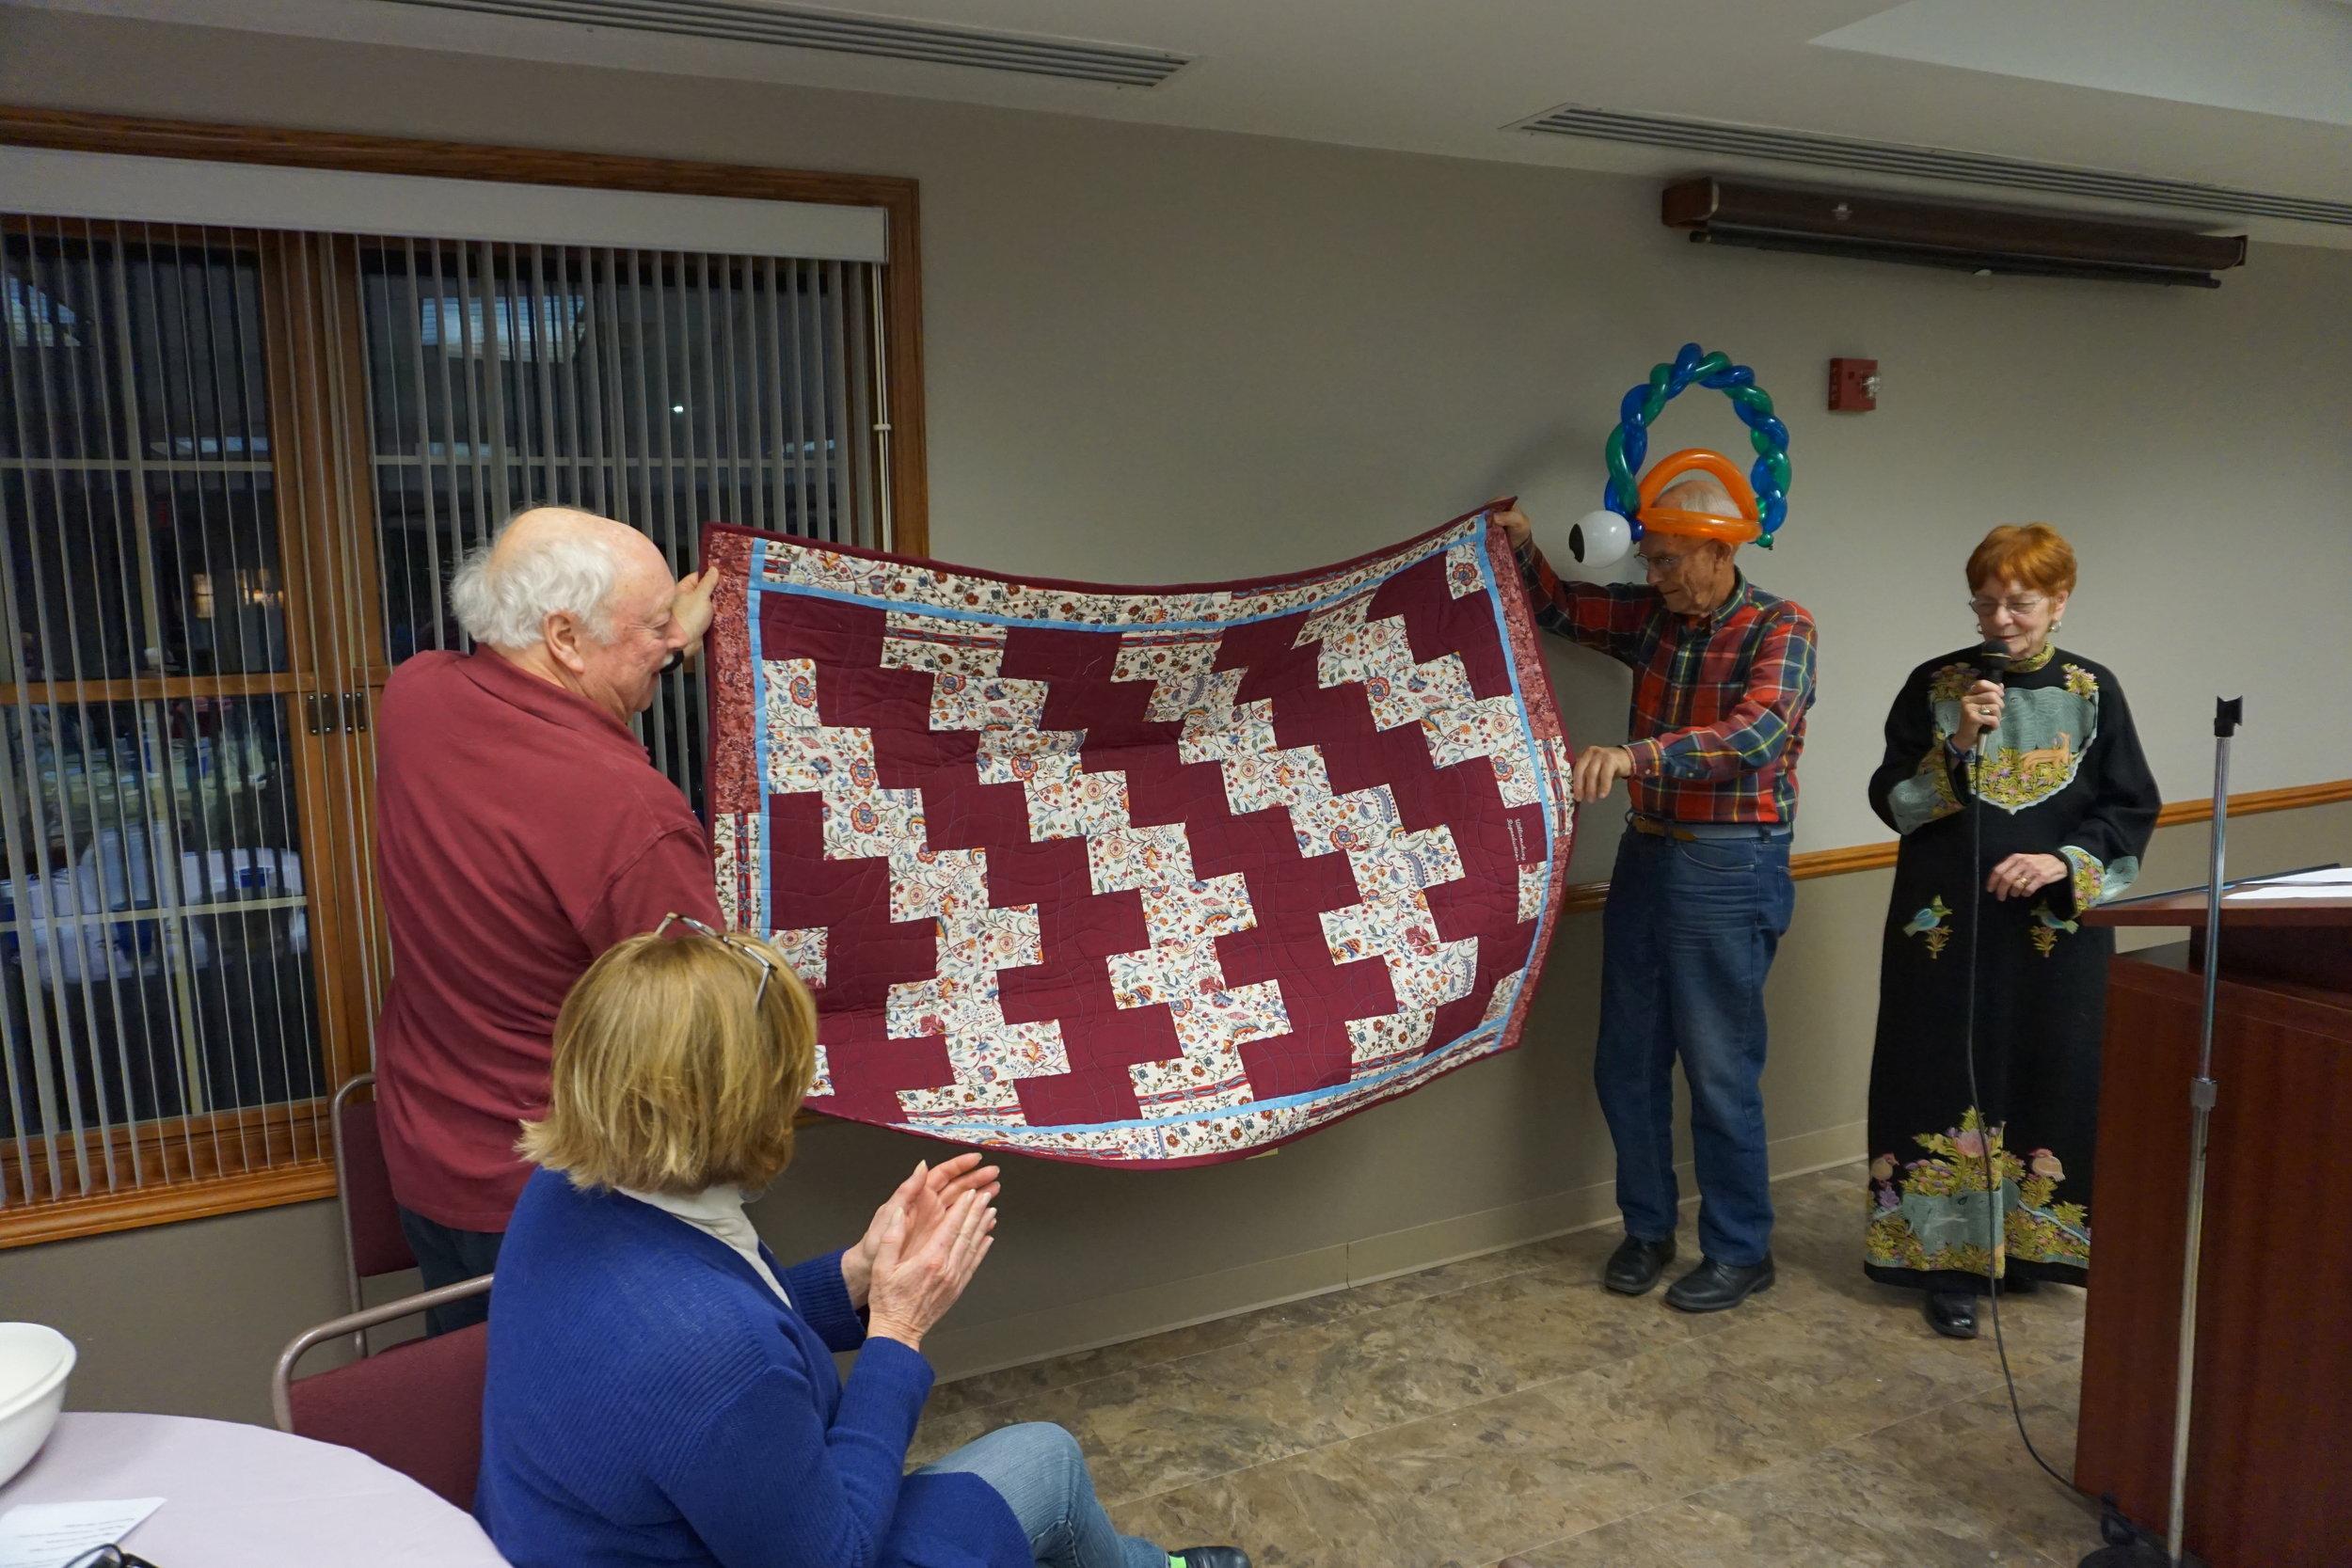 Leadership team member Bill Meers reveals the beautiful quilt door prize created by Museum board member,Charlotte Paugh.